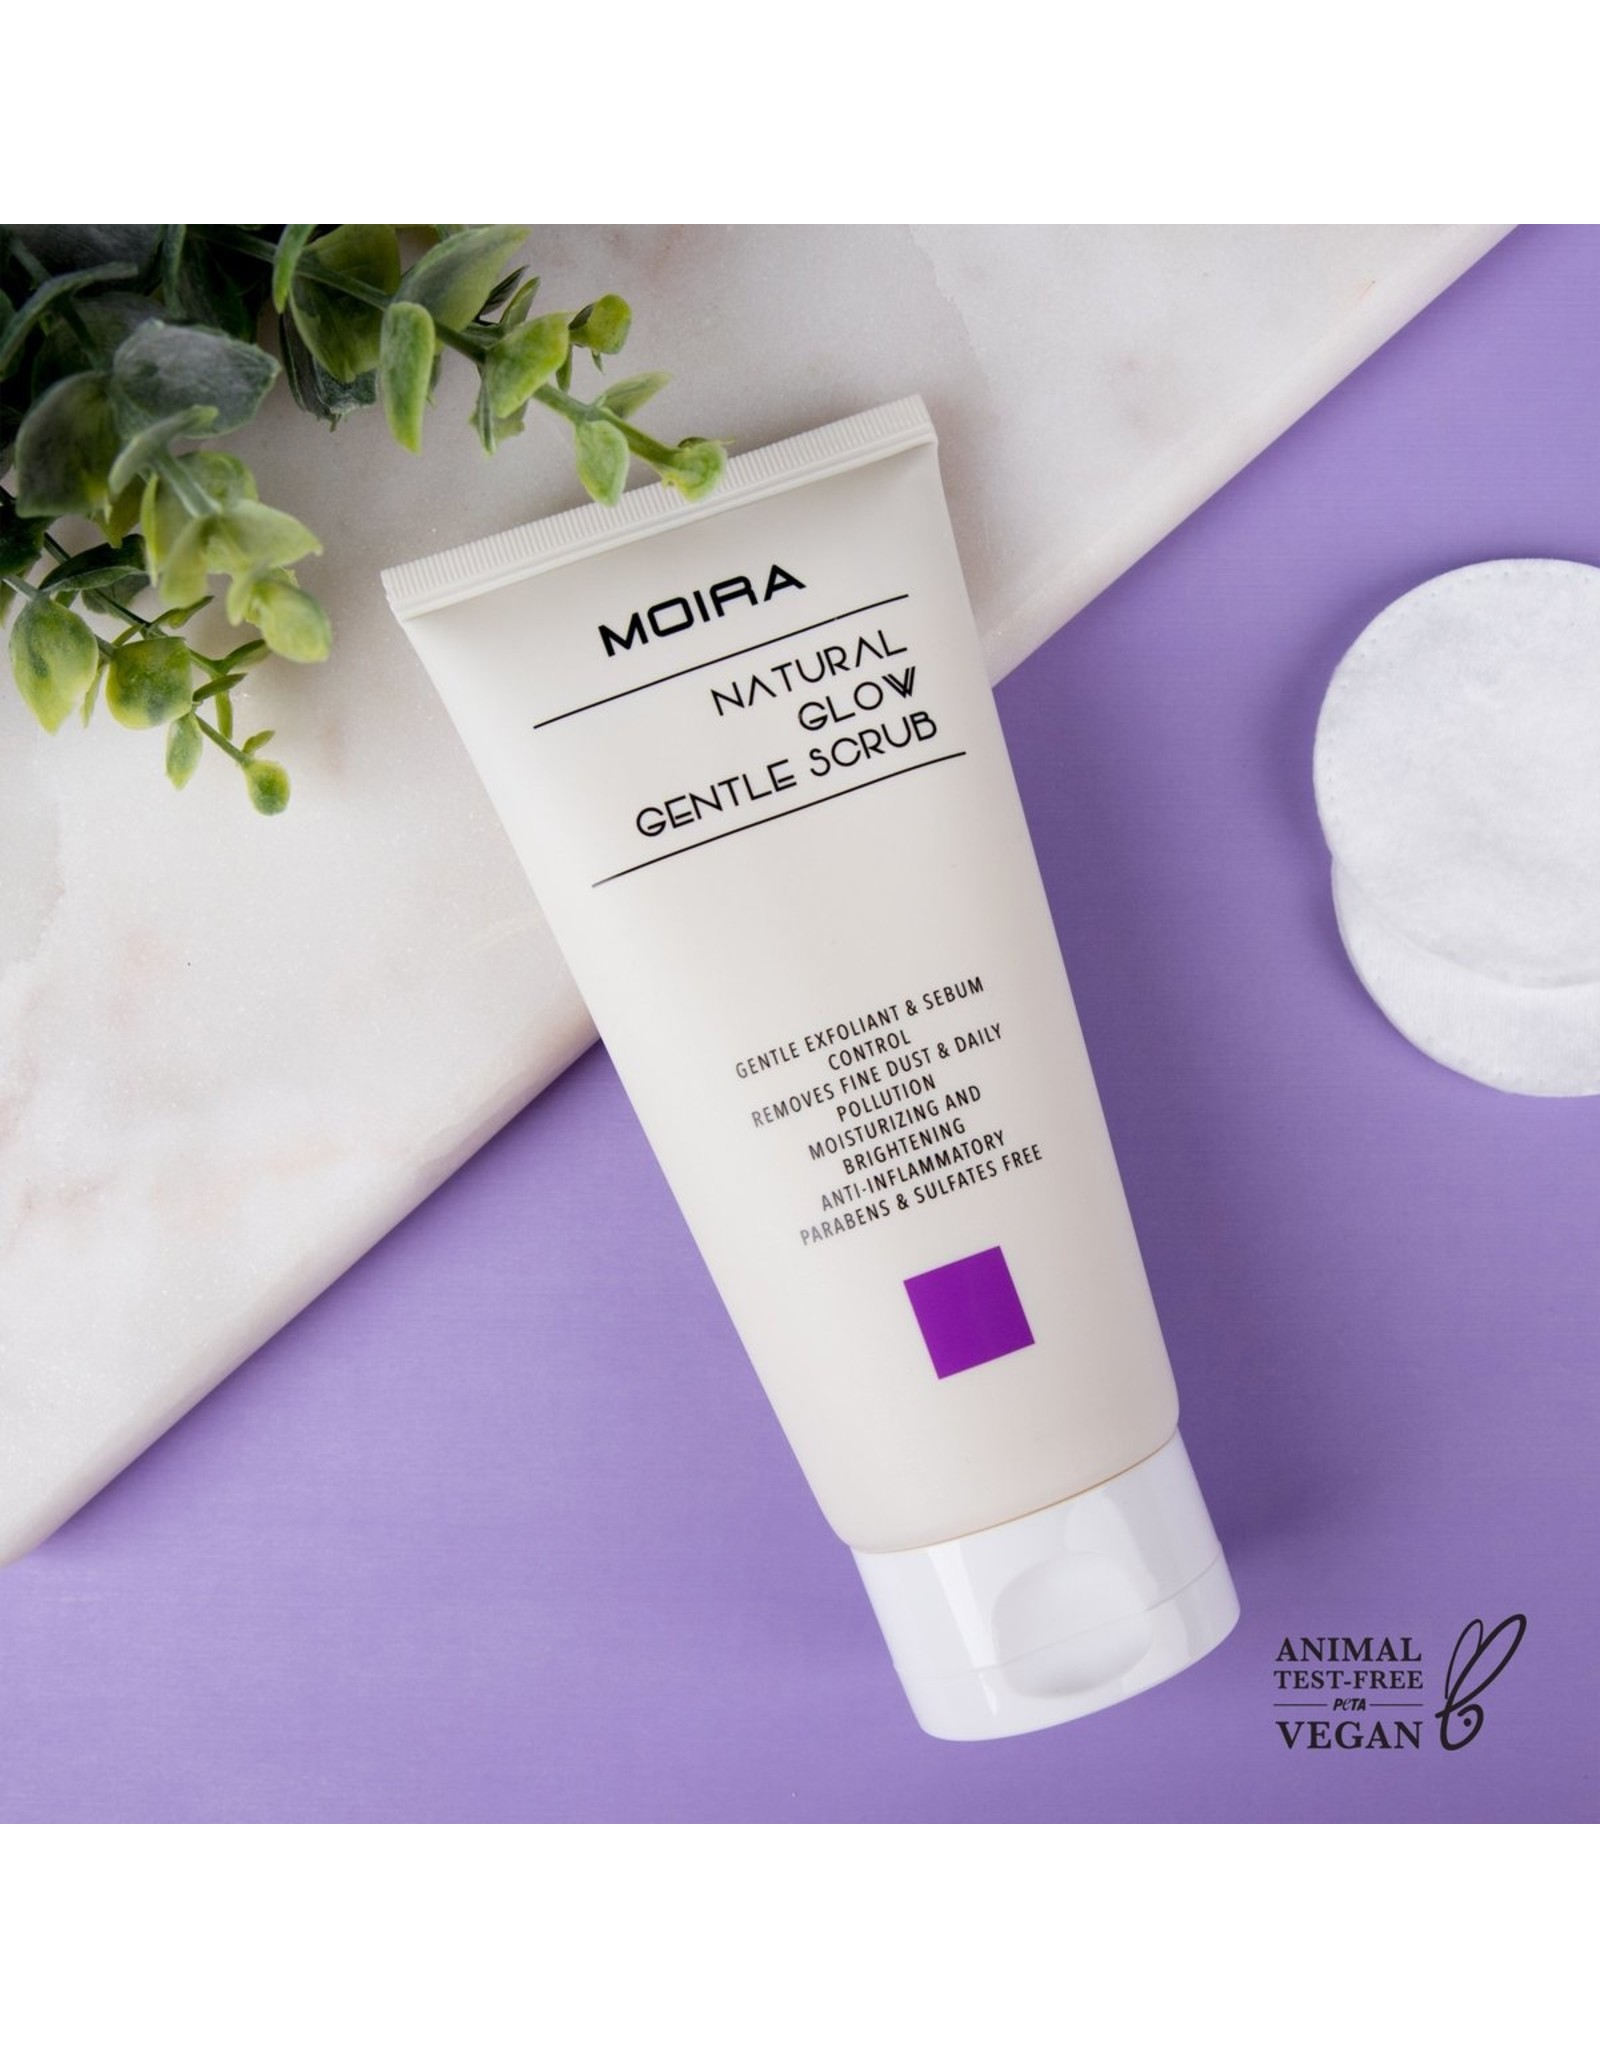 Moira Cleansing FoamNatural Glow Gentle Scrub